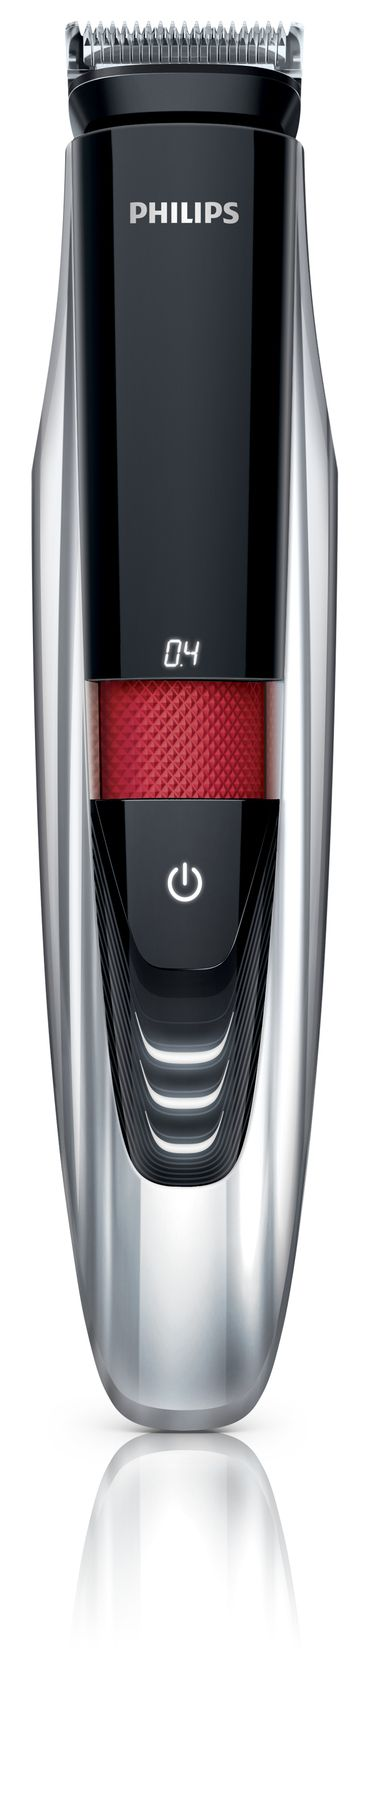 Beardtrimmer series 9000 waterproof beard trimmer